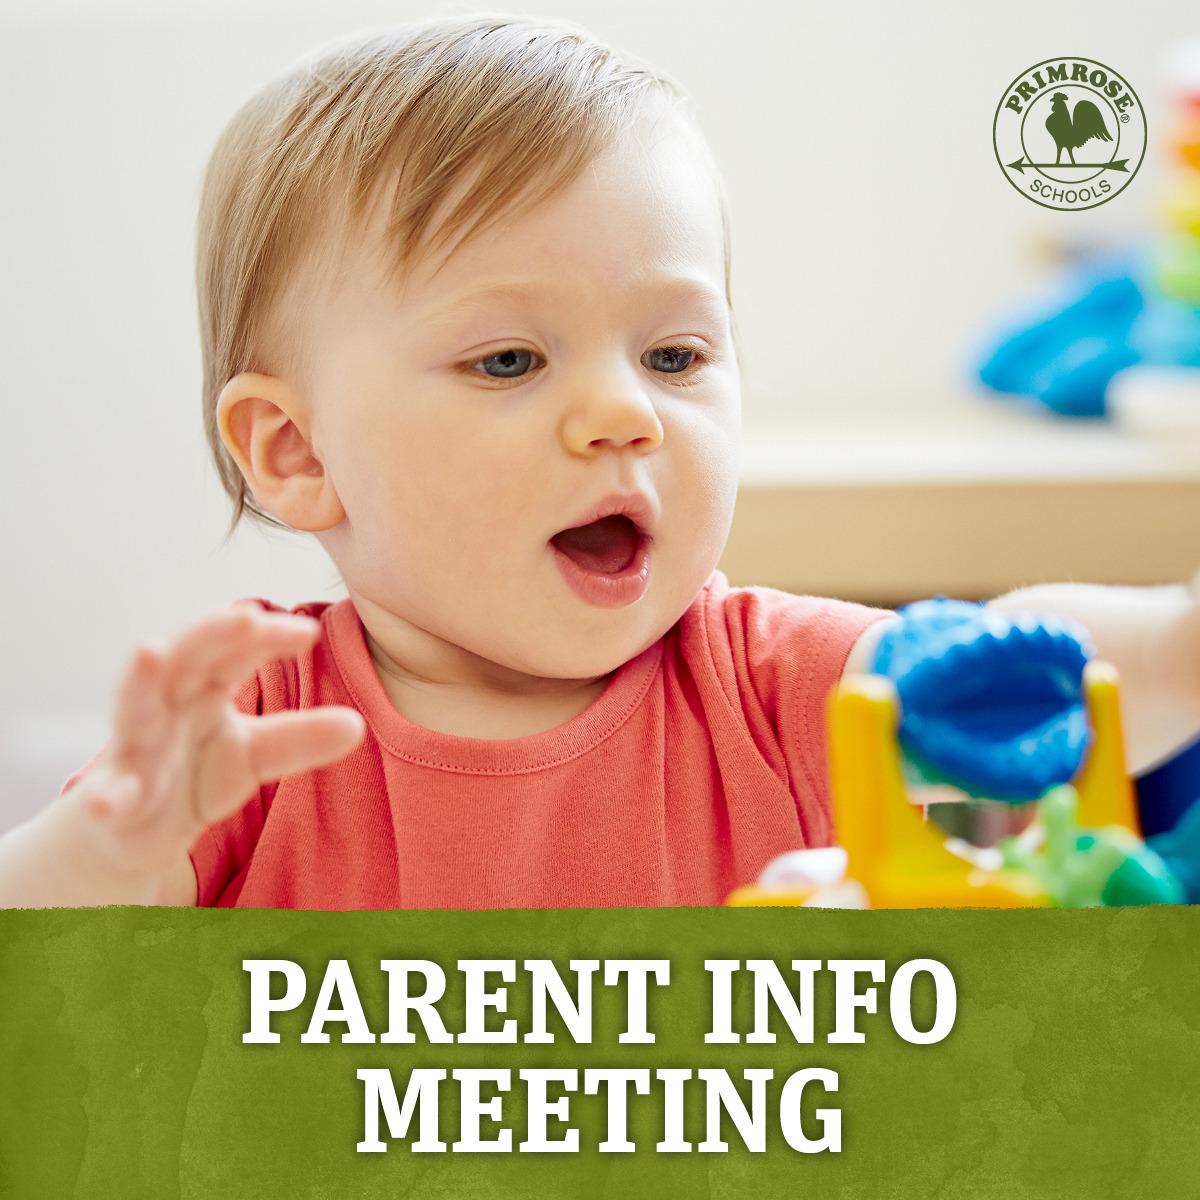 Parent Information Meeting Website Graphic